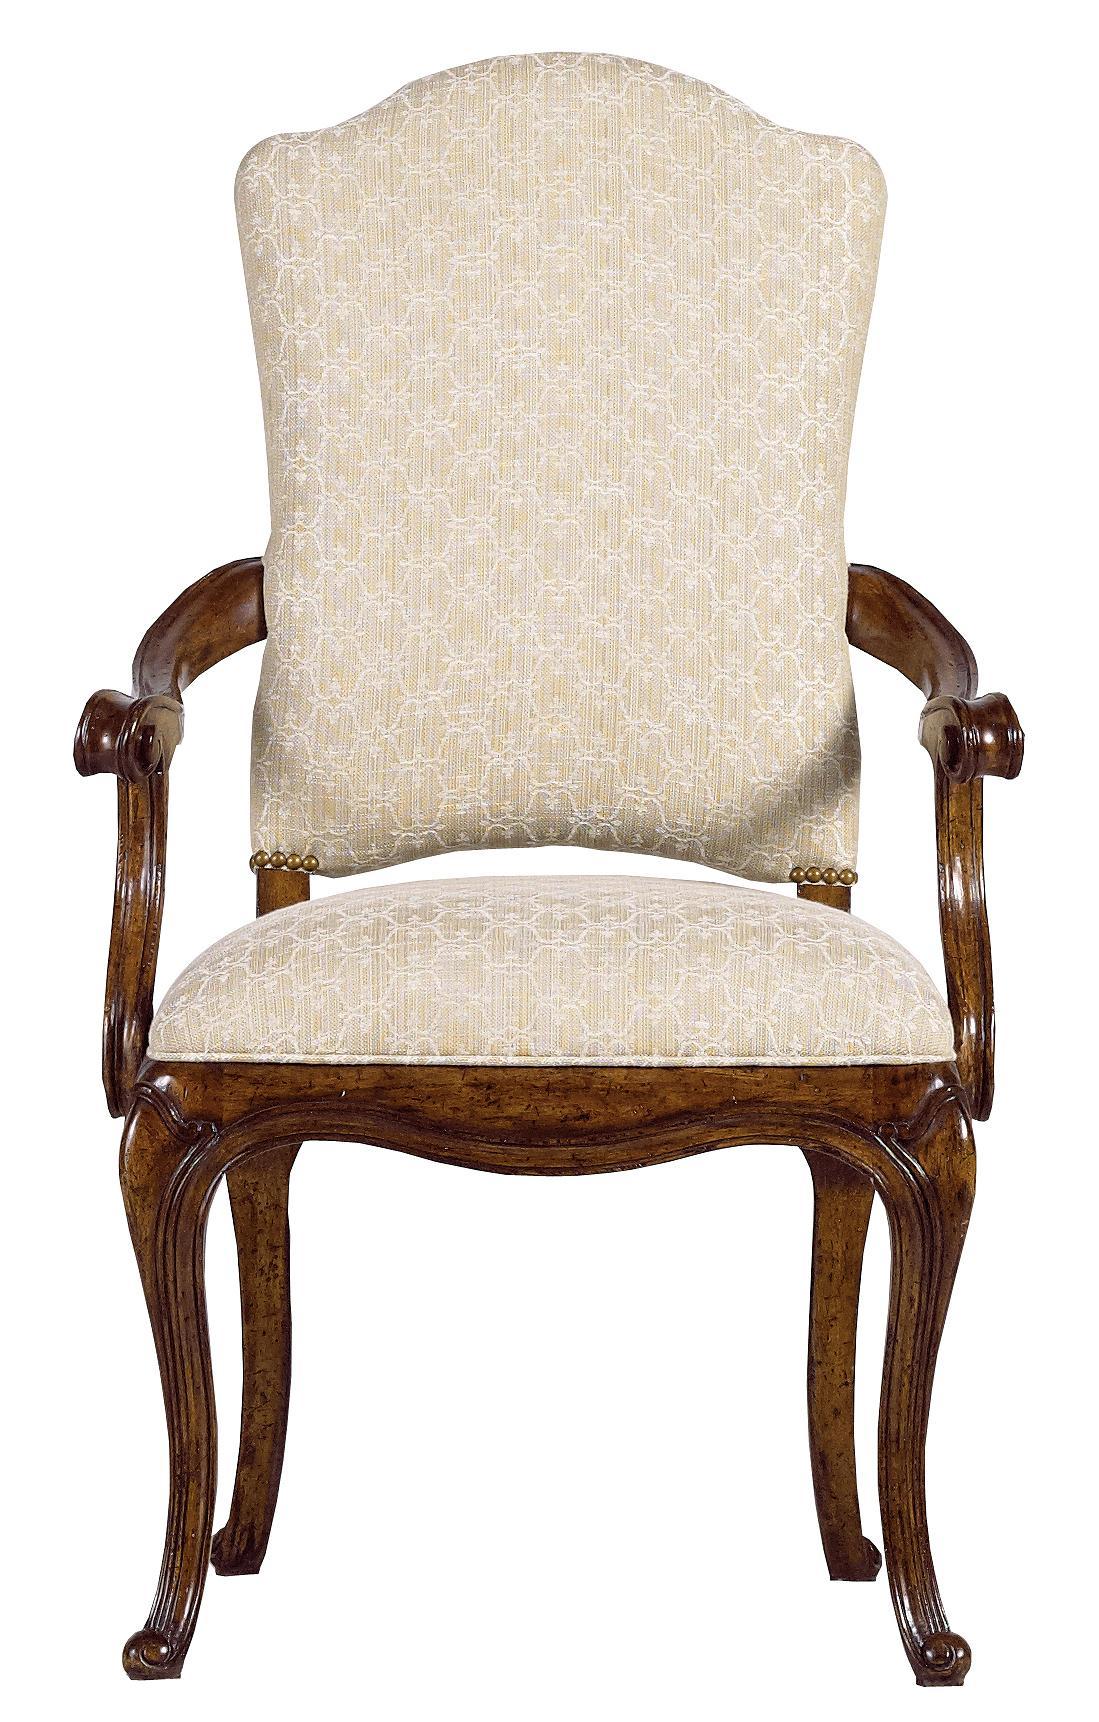 Stanley Furniture Arrondissement Volute Arm Chair - Item Number: 222-11-75